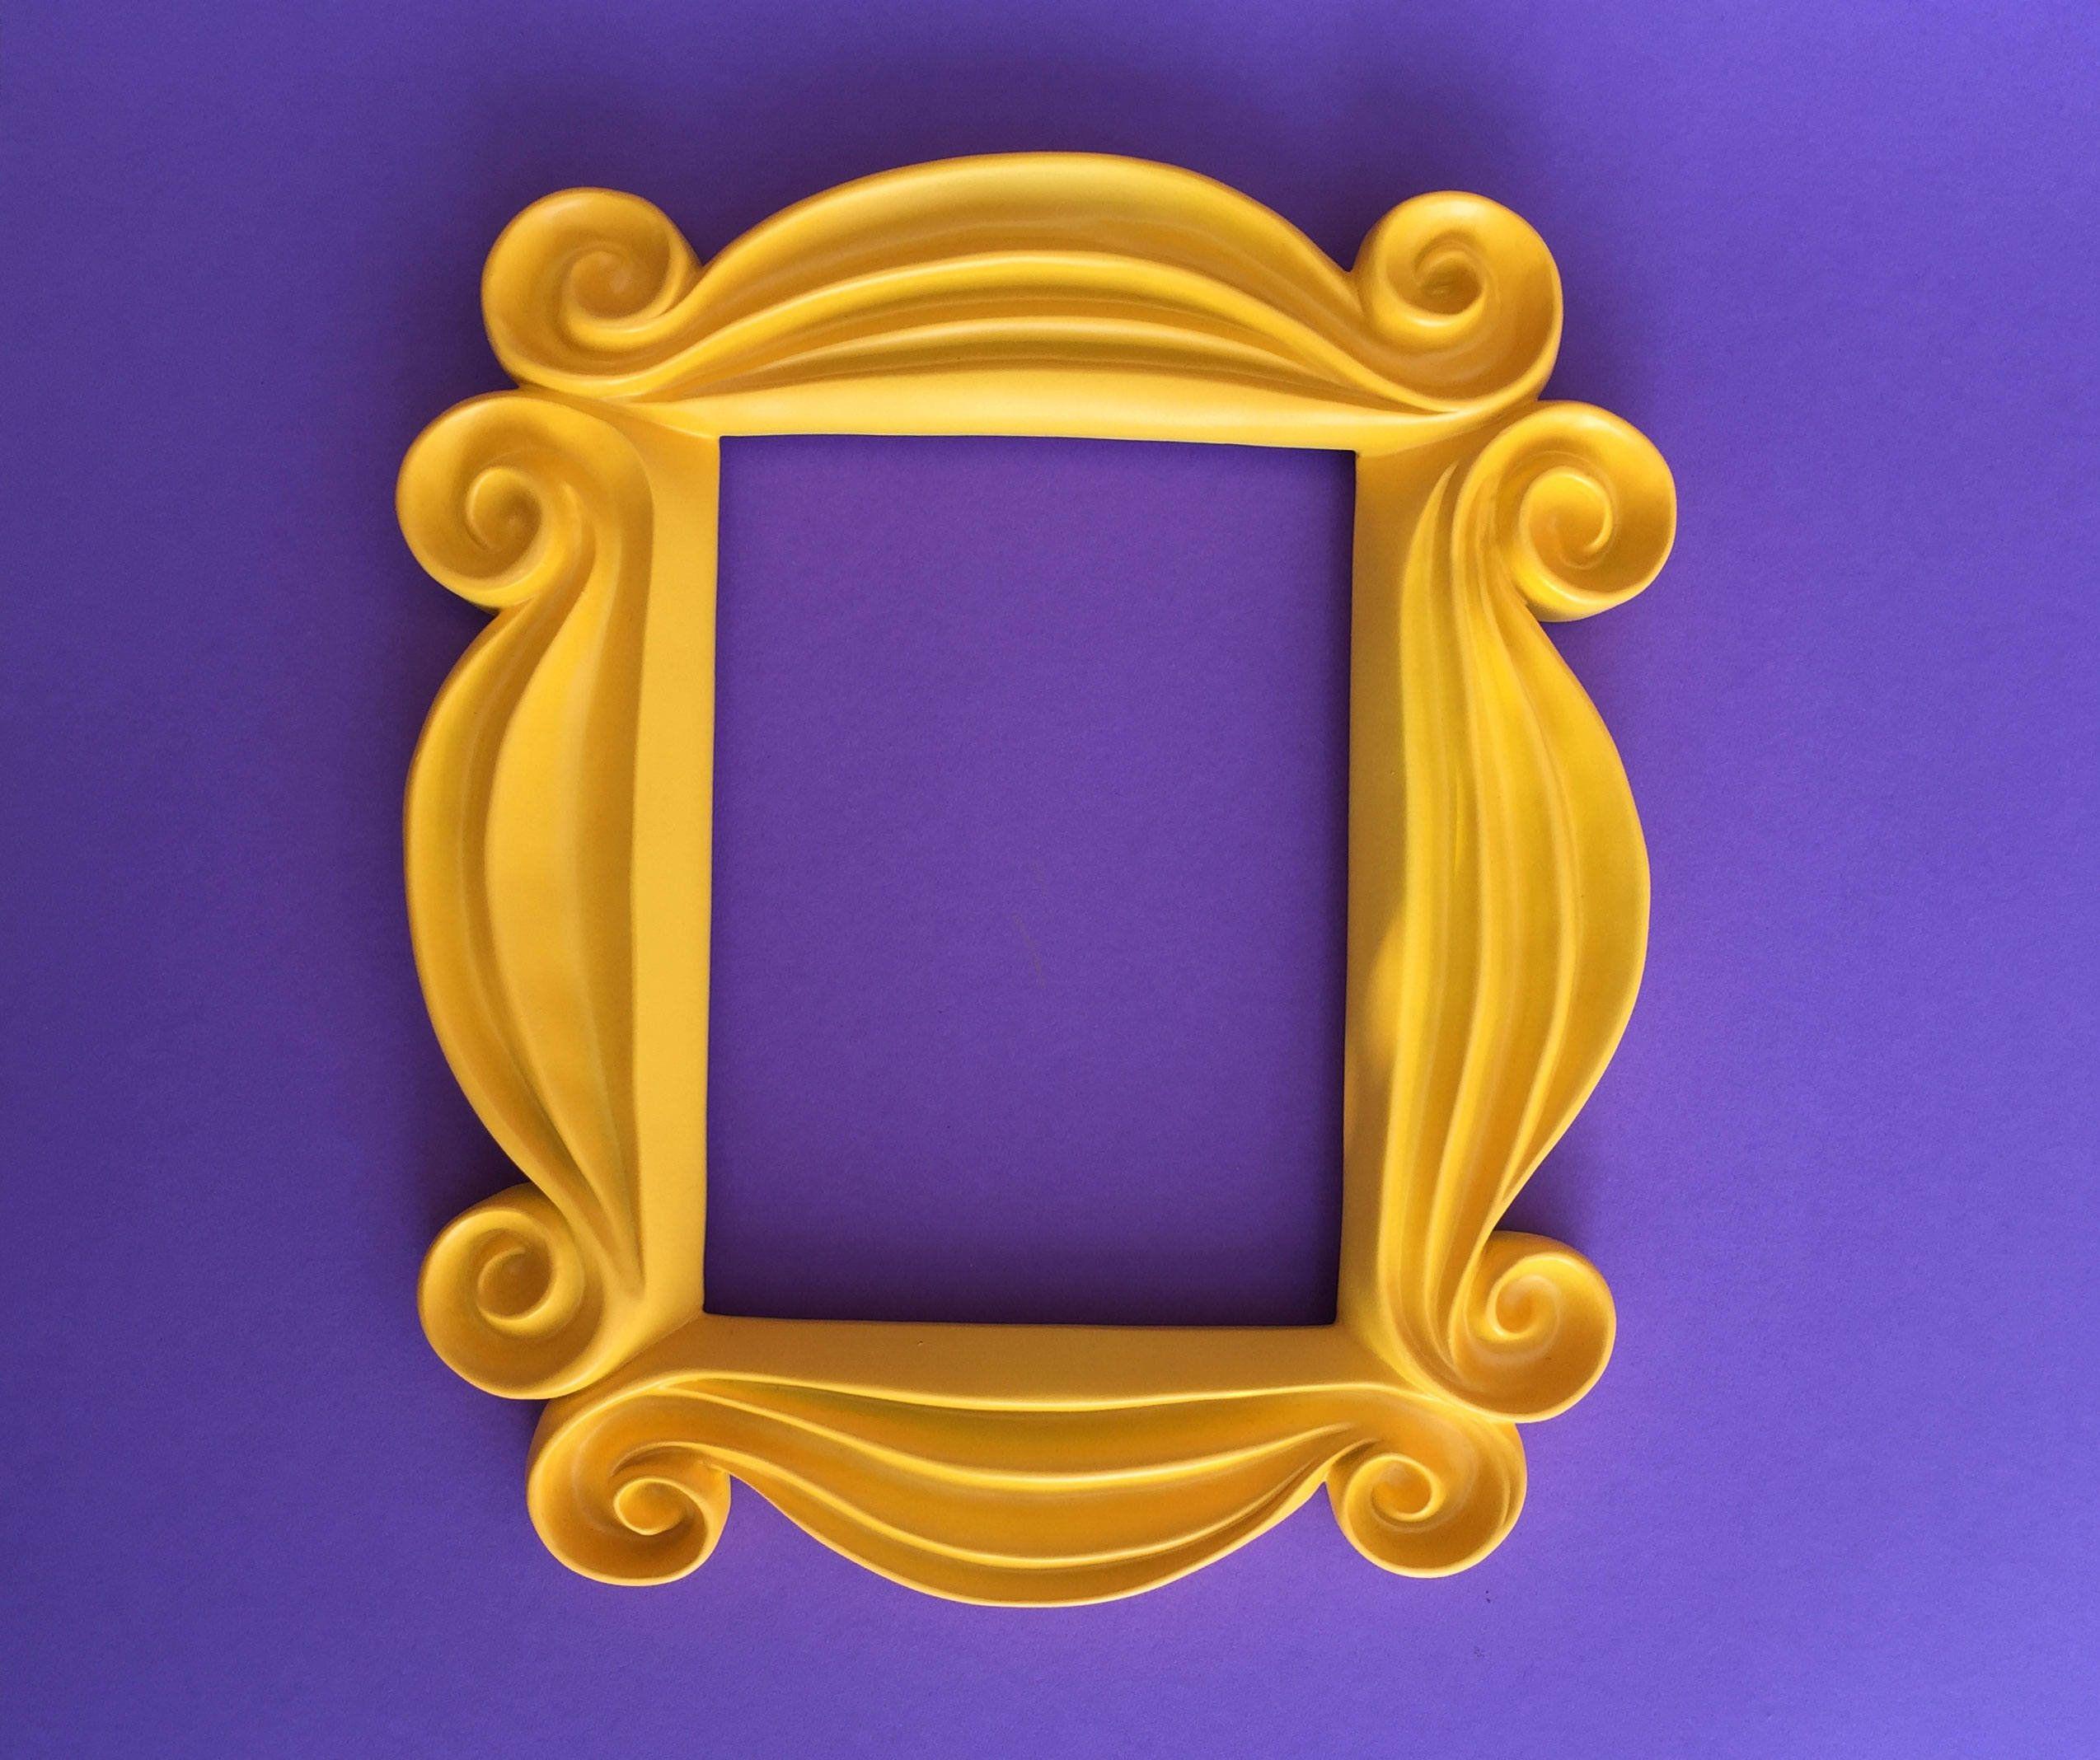 Friends peephole frame replica 3d printed door frame